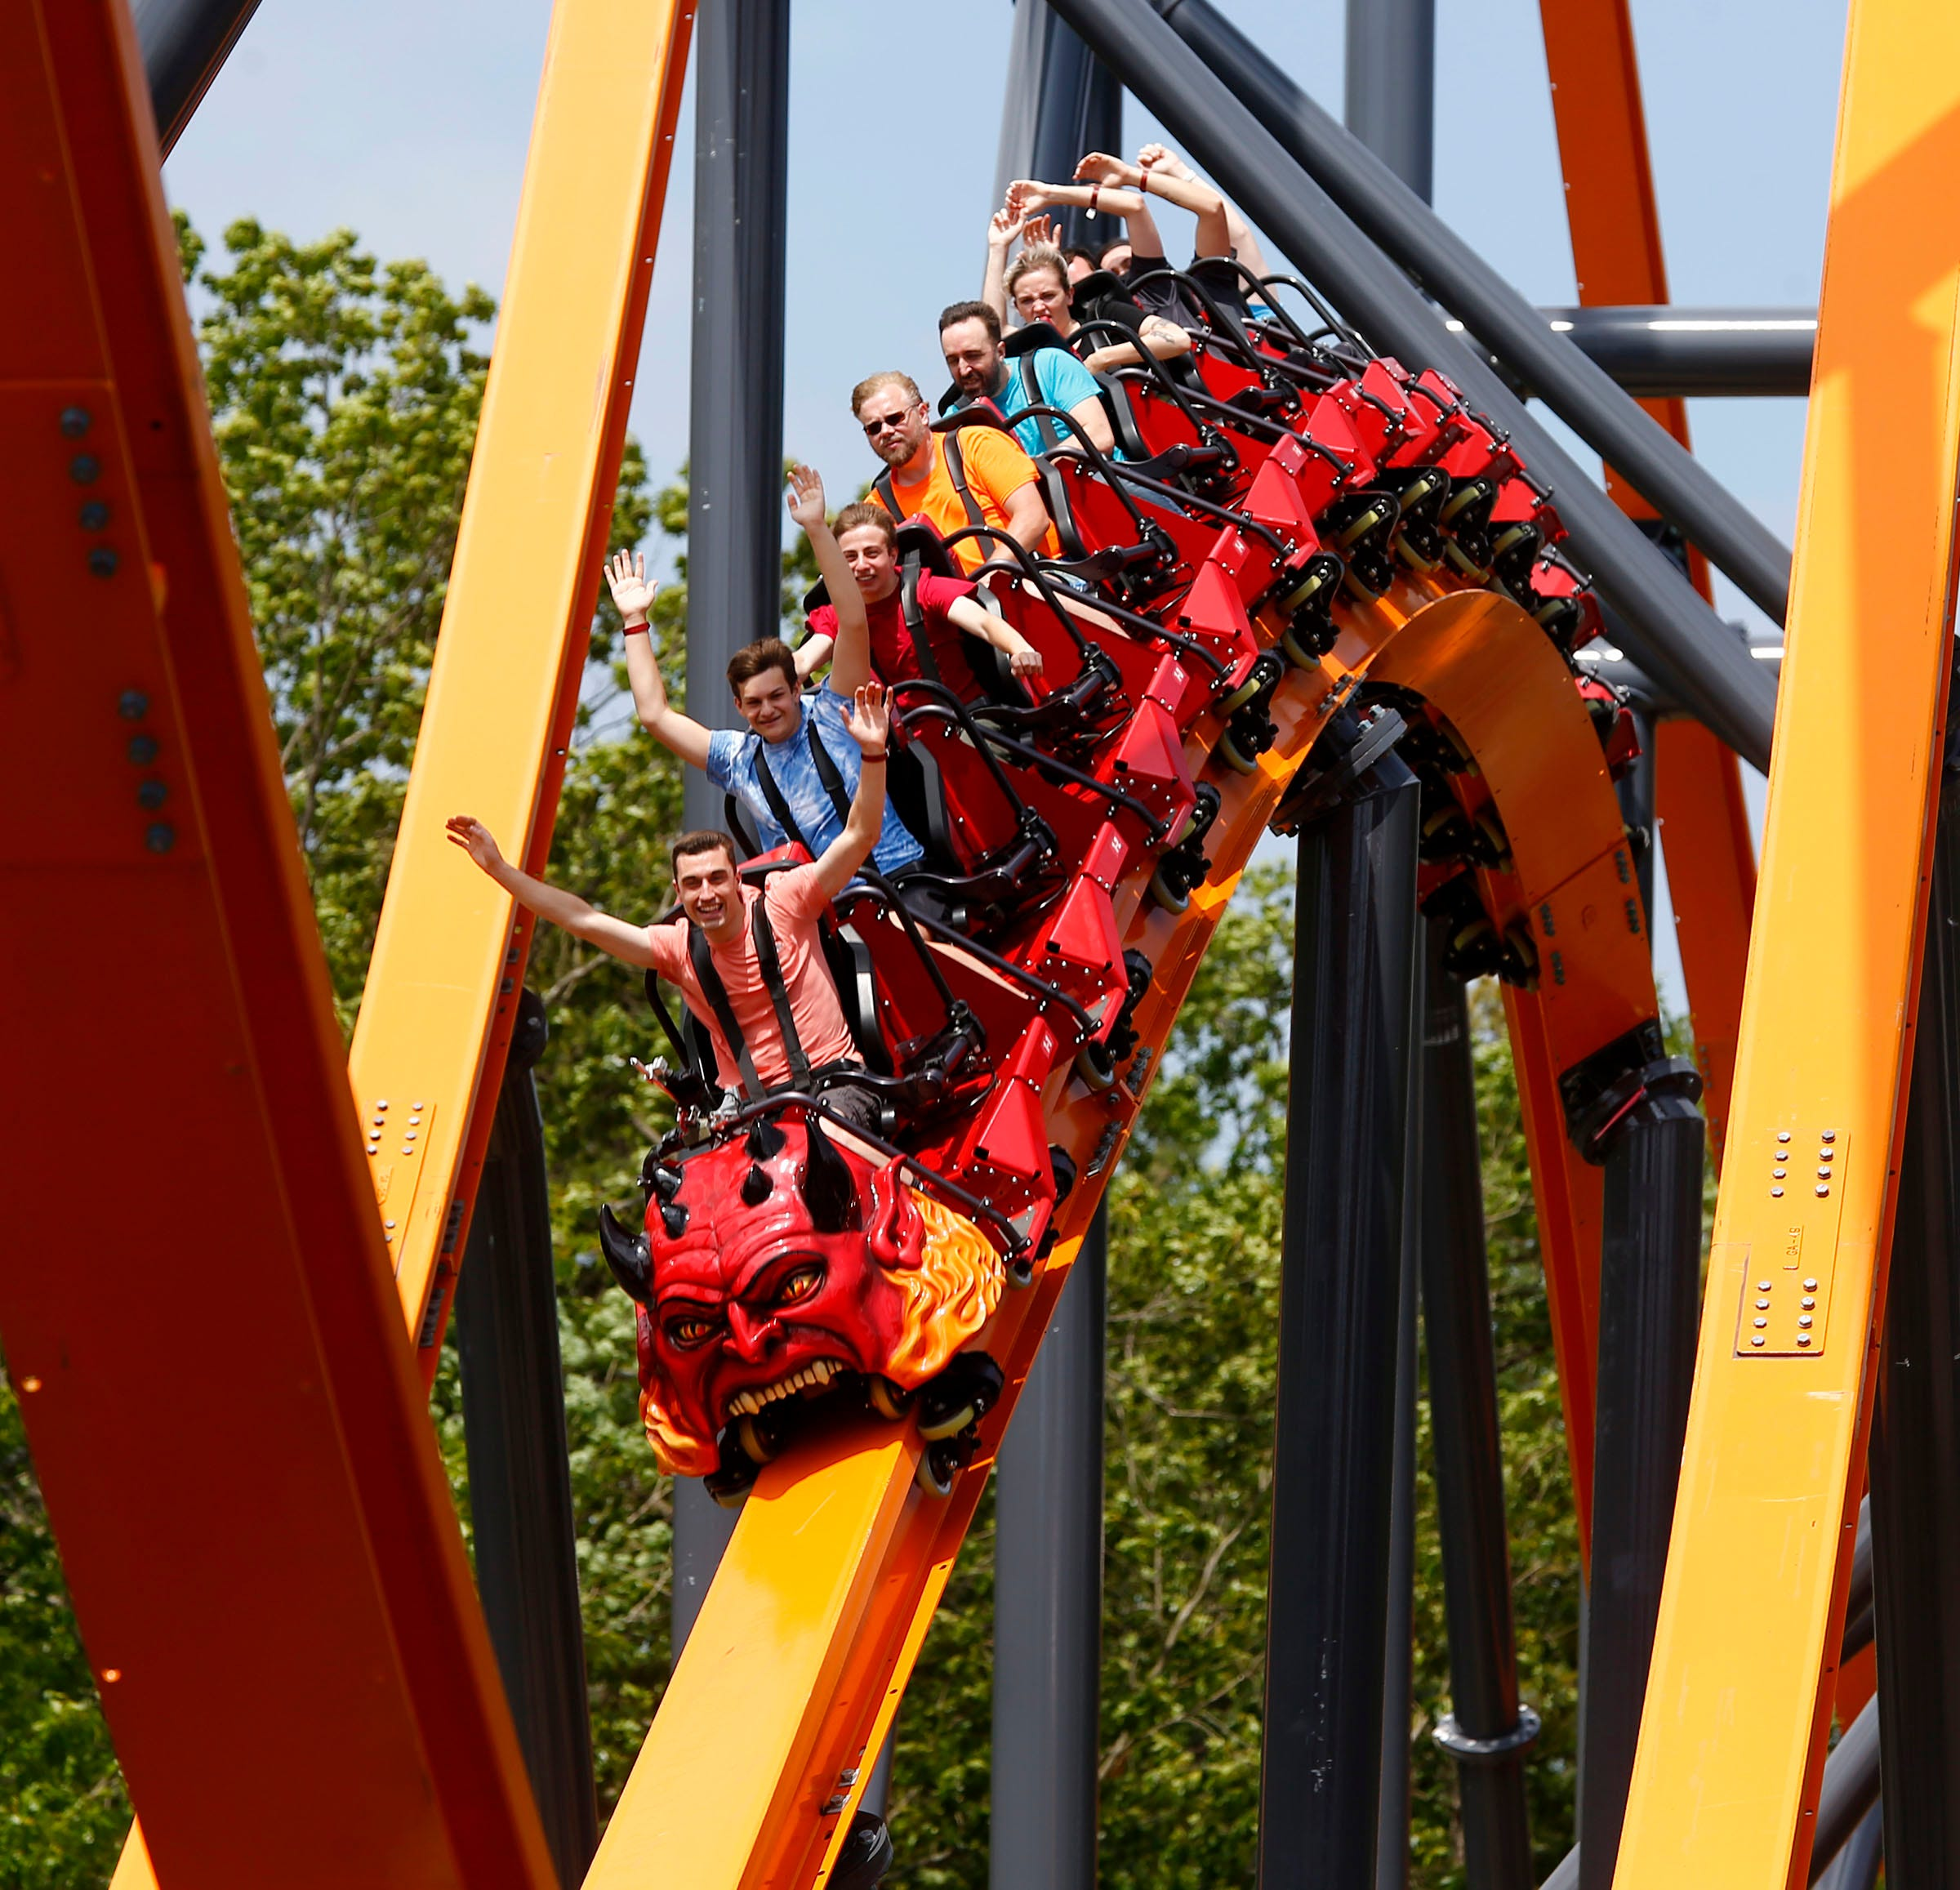 Jersey Devil World S Tallest Single Rail Roller Coaster Opens Cnn Travel